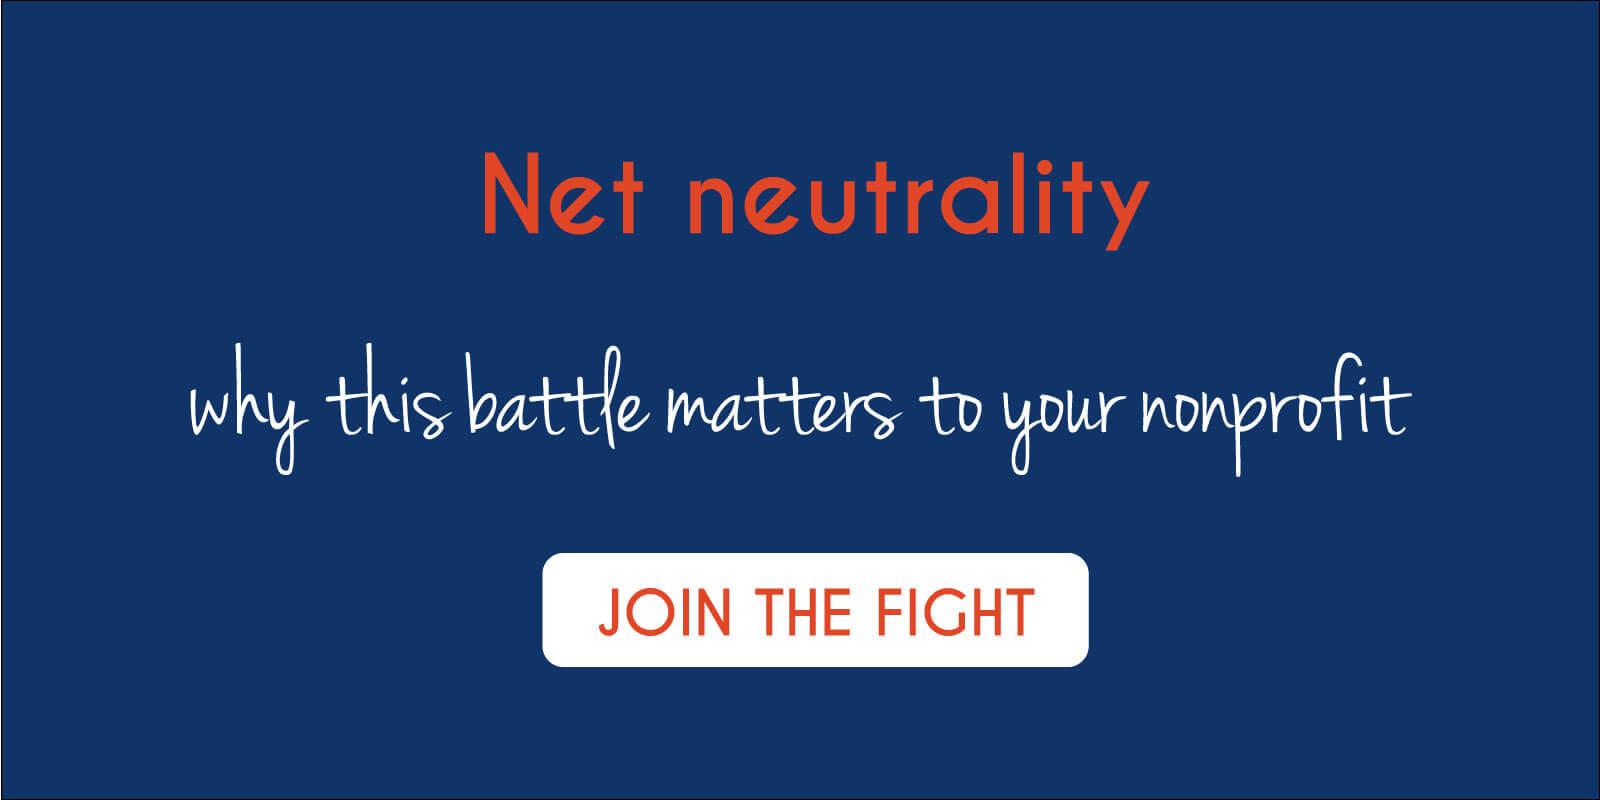 net-neutrality-for-nonprofits